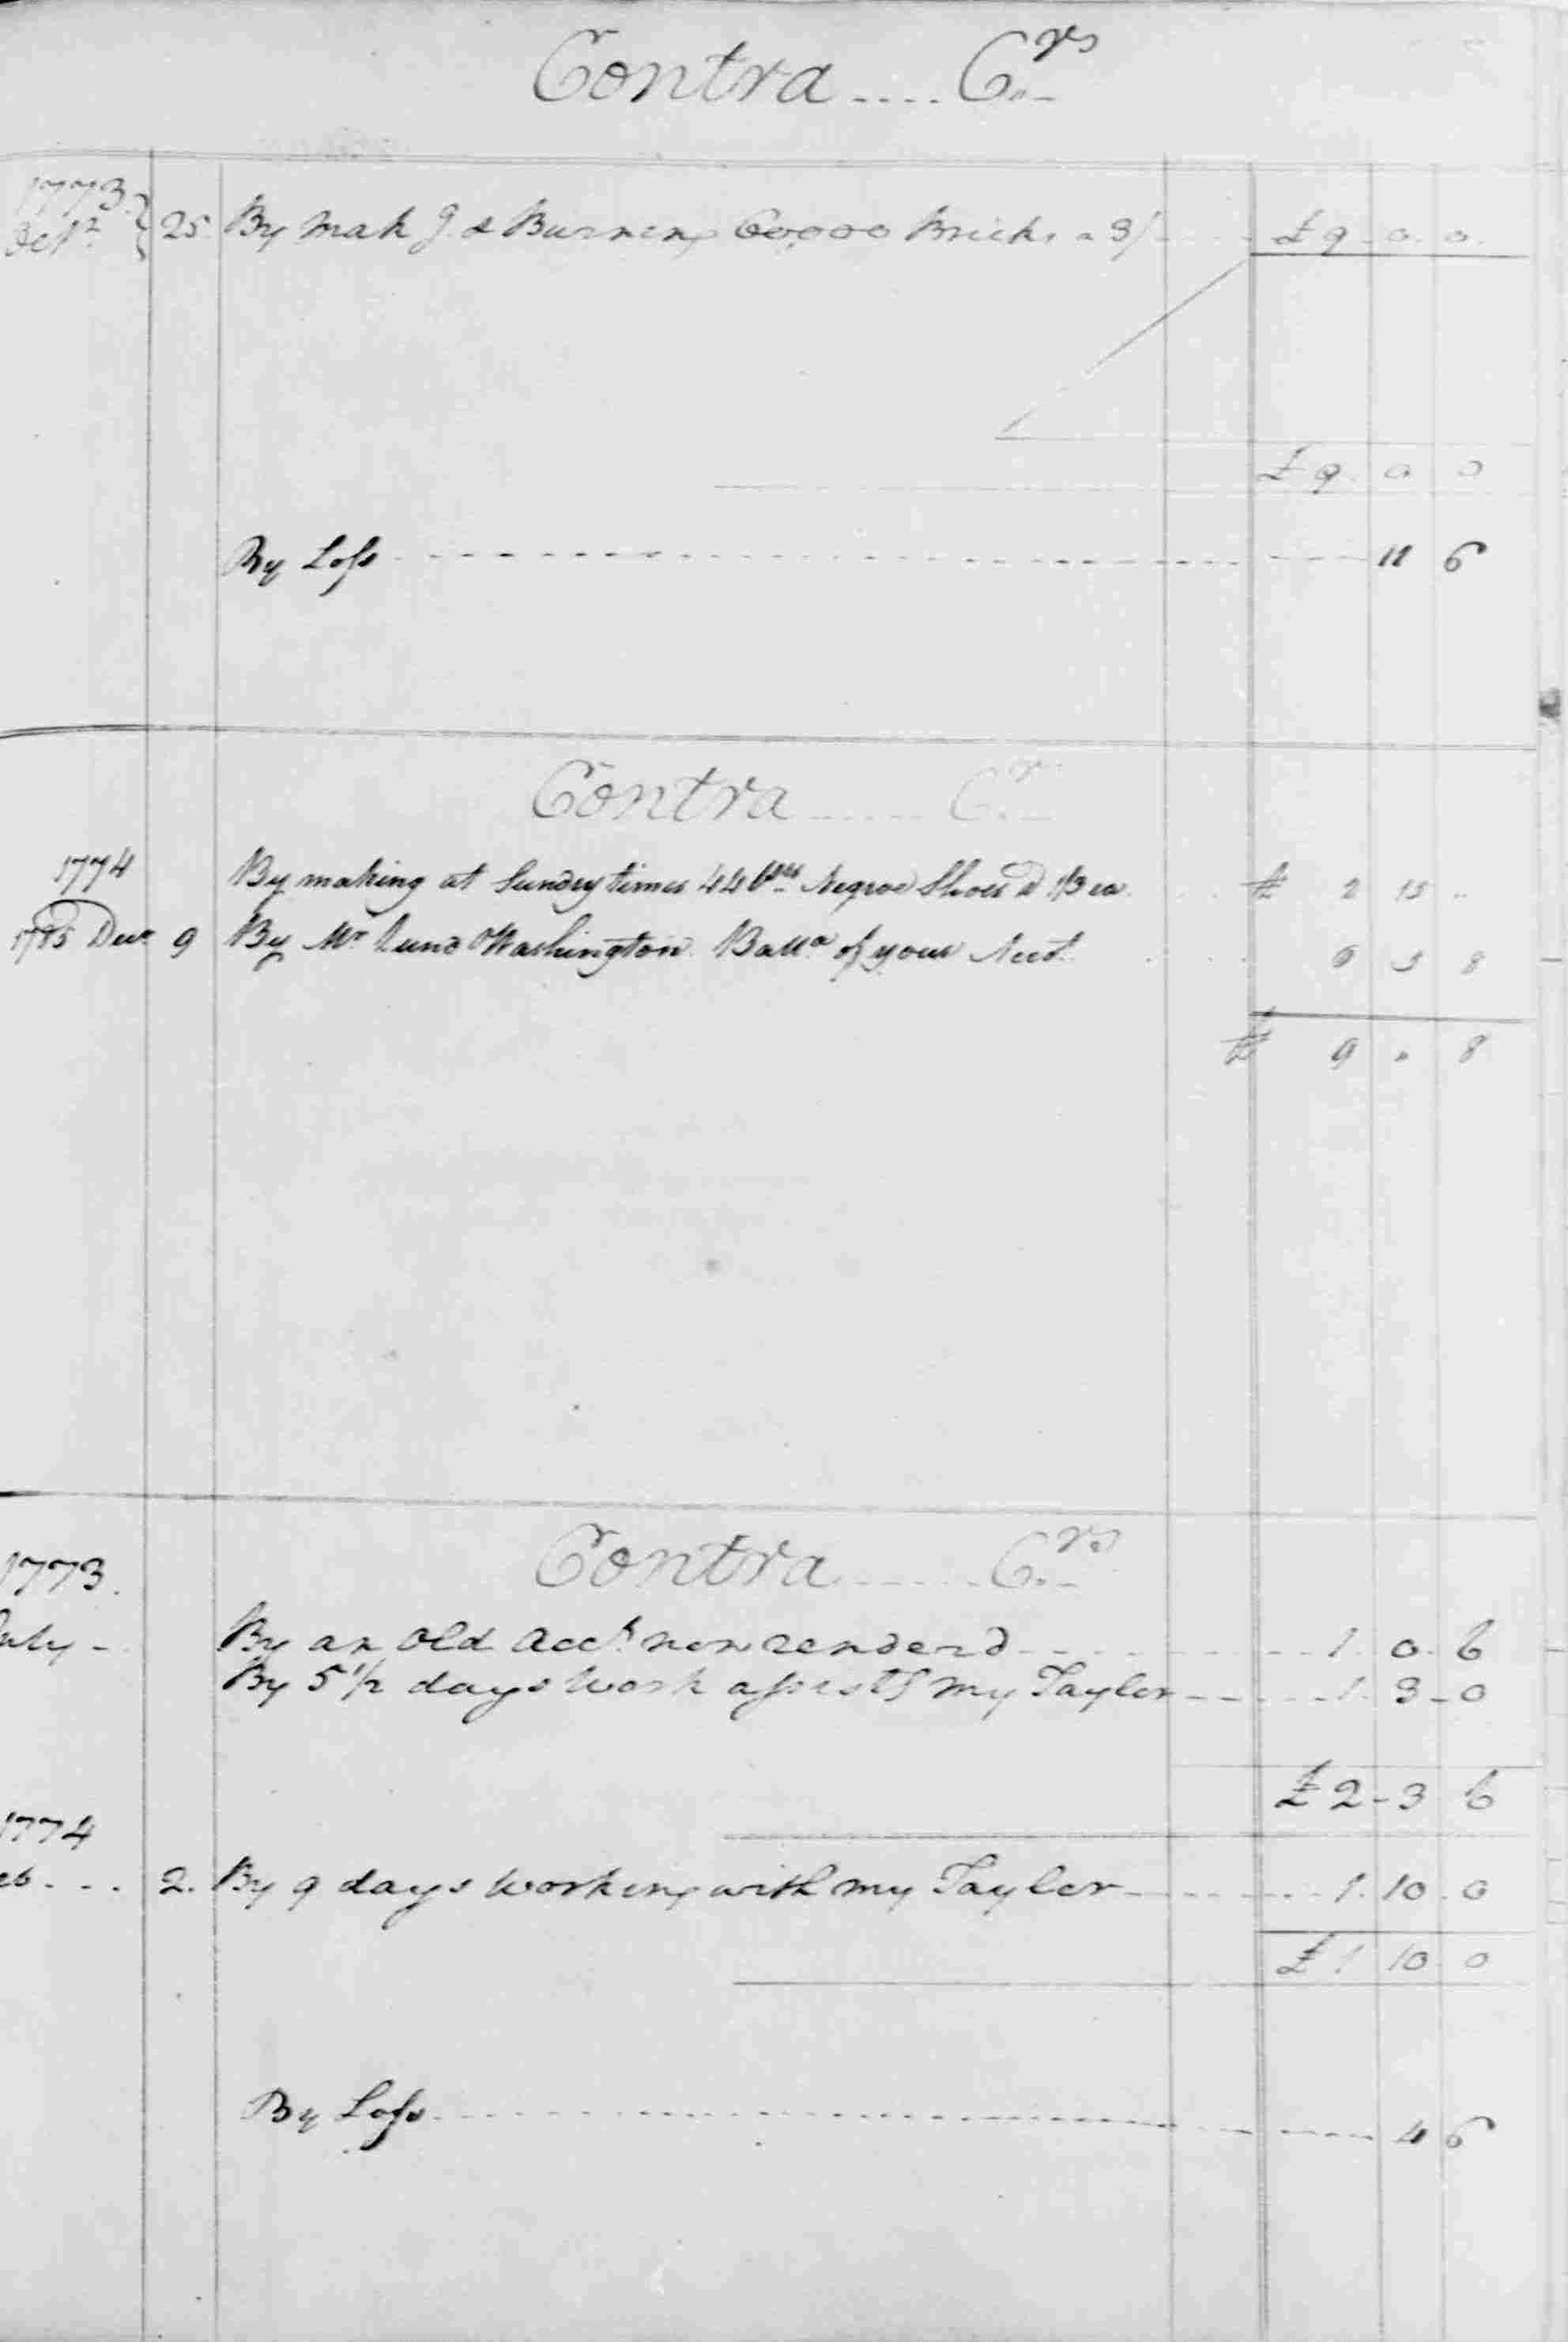 Ledger B, folio 77, right side